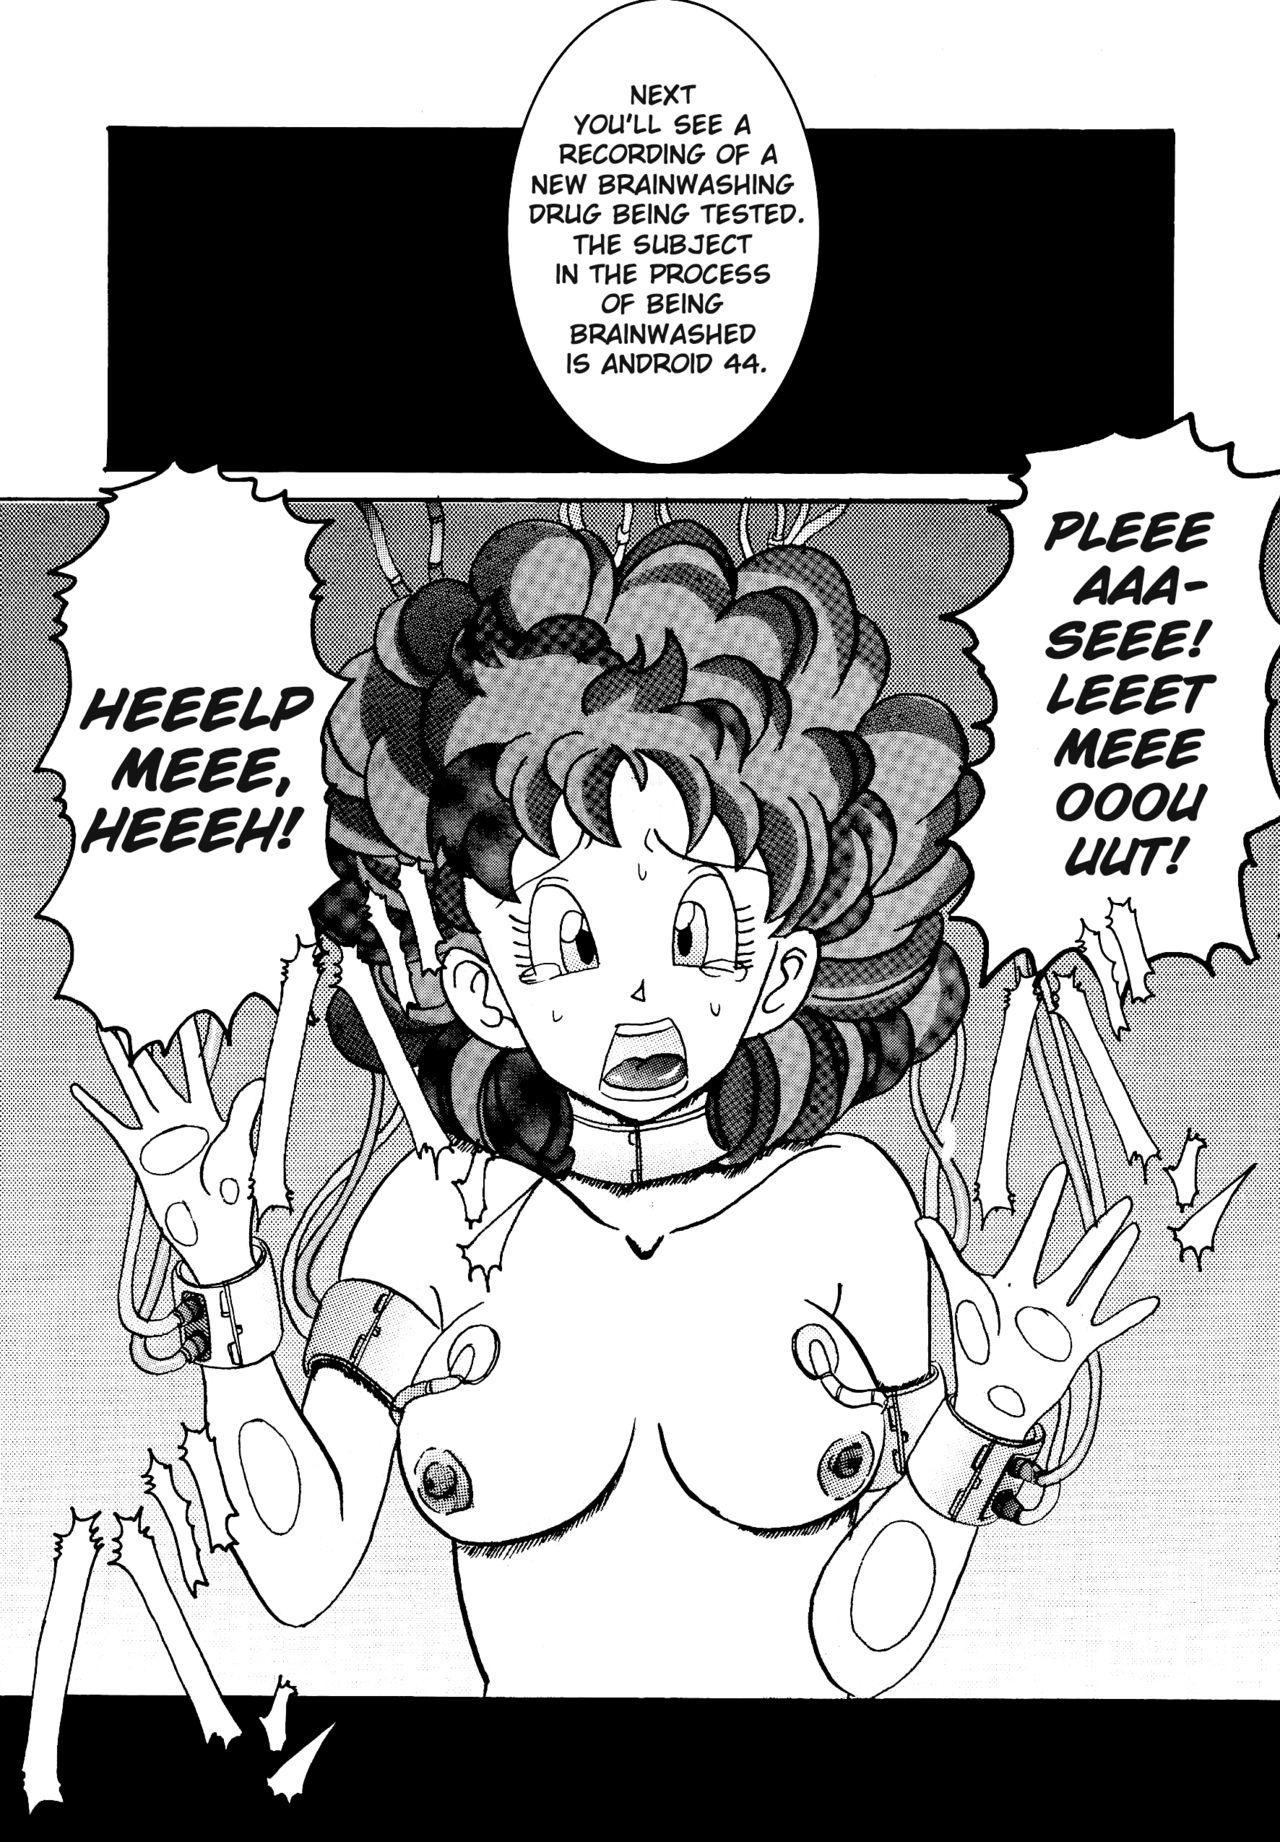 [Light Rate Port Pink] Tanjou!! Aku no Onna Senshi Jinzou Ningen 18-gou Sennou Kaizou Keikaku -Joshou- (Dragon Ball Z) [English] [ChoriScans] 6